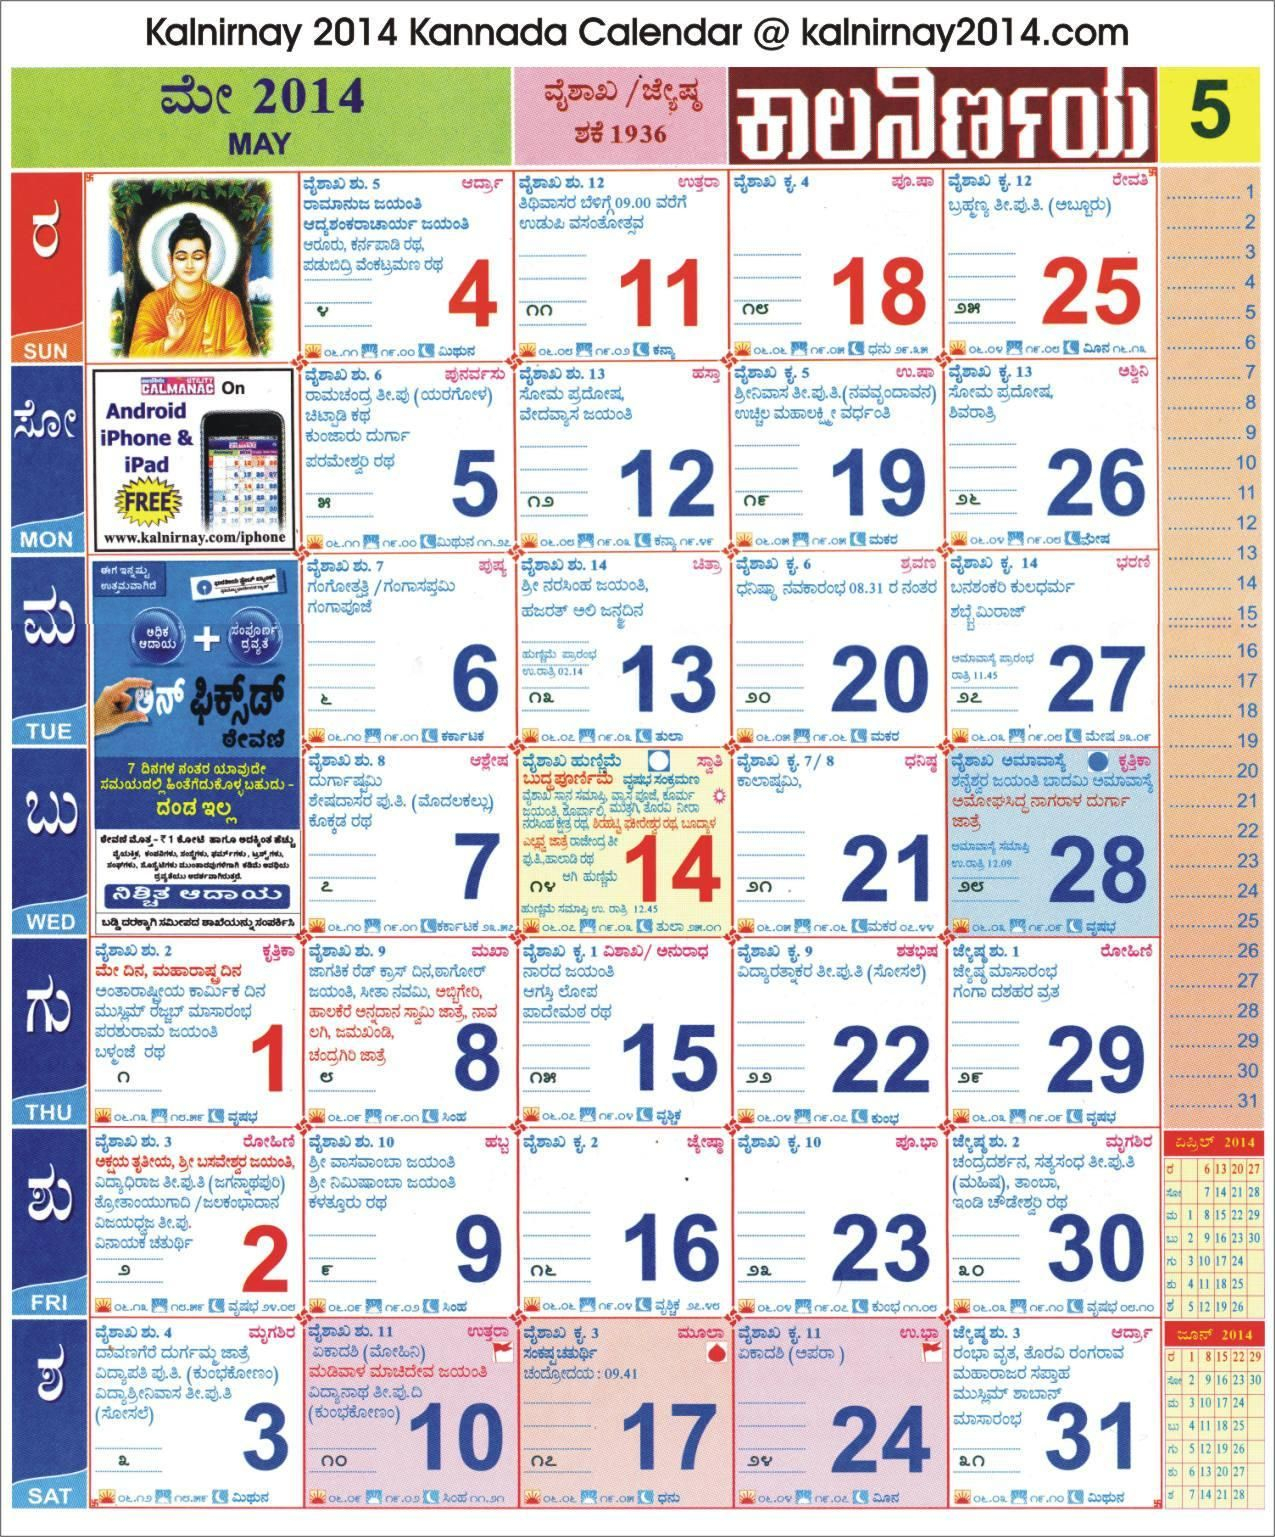 May 2014 Kannada Kalnirnay Calendar | Calendar, Website, October in Kannada Calendar 2020 August